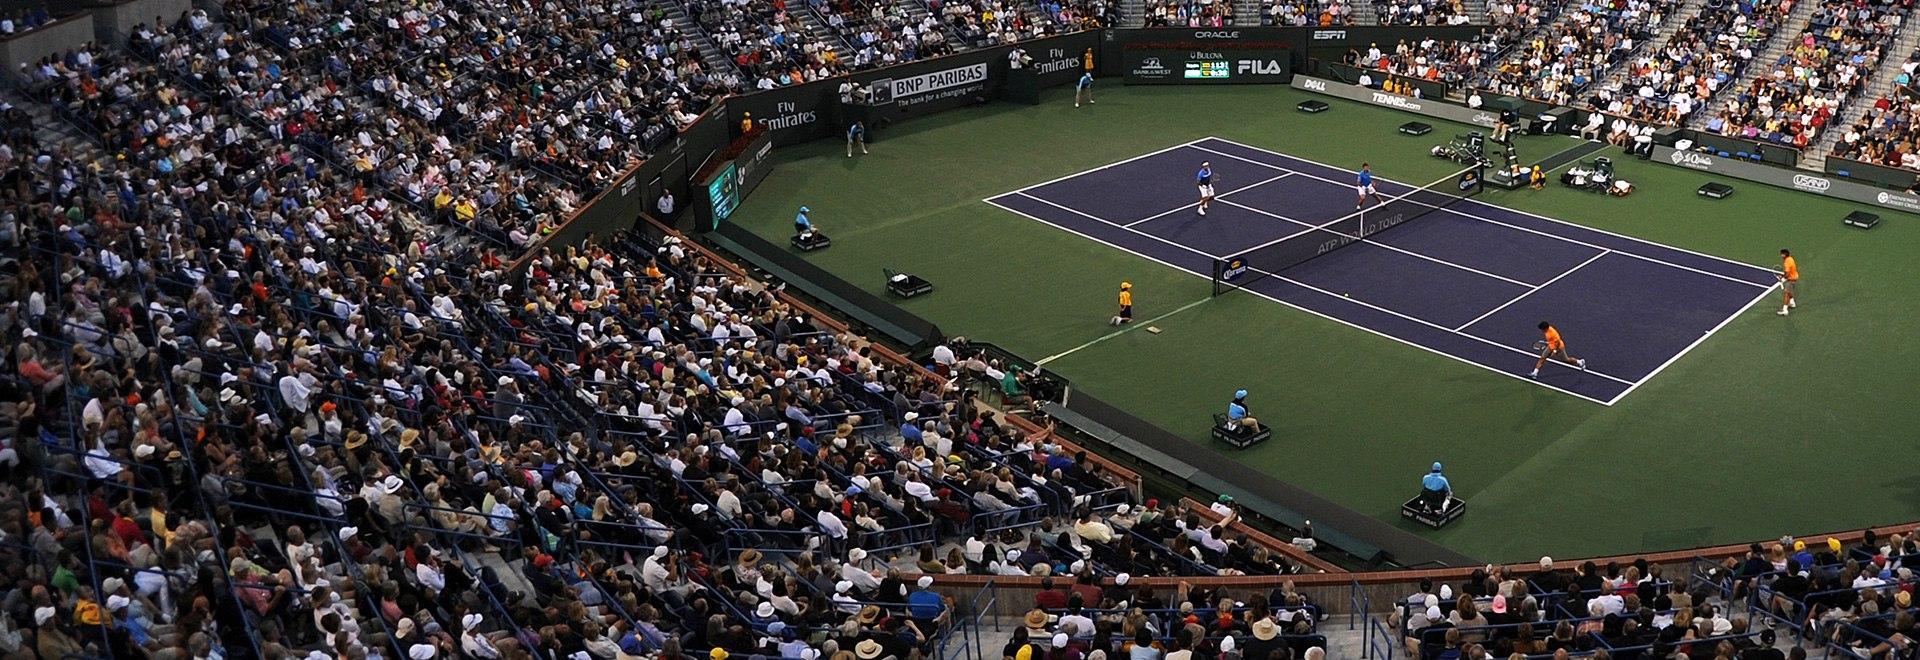 ATP Indian Wells 2005